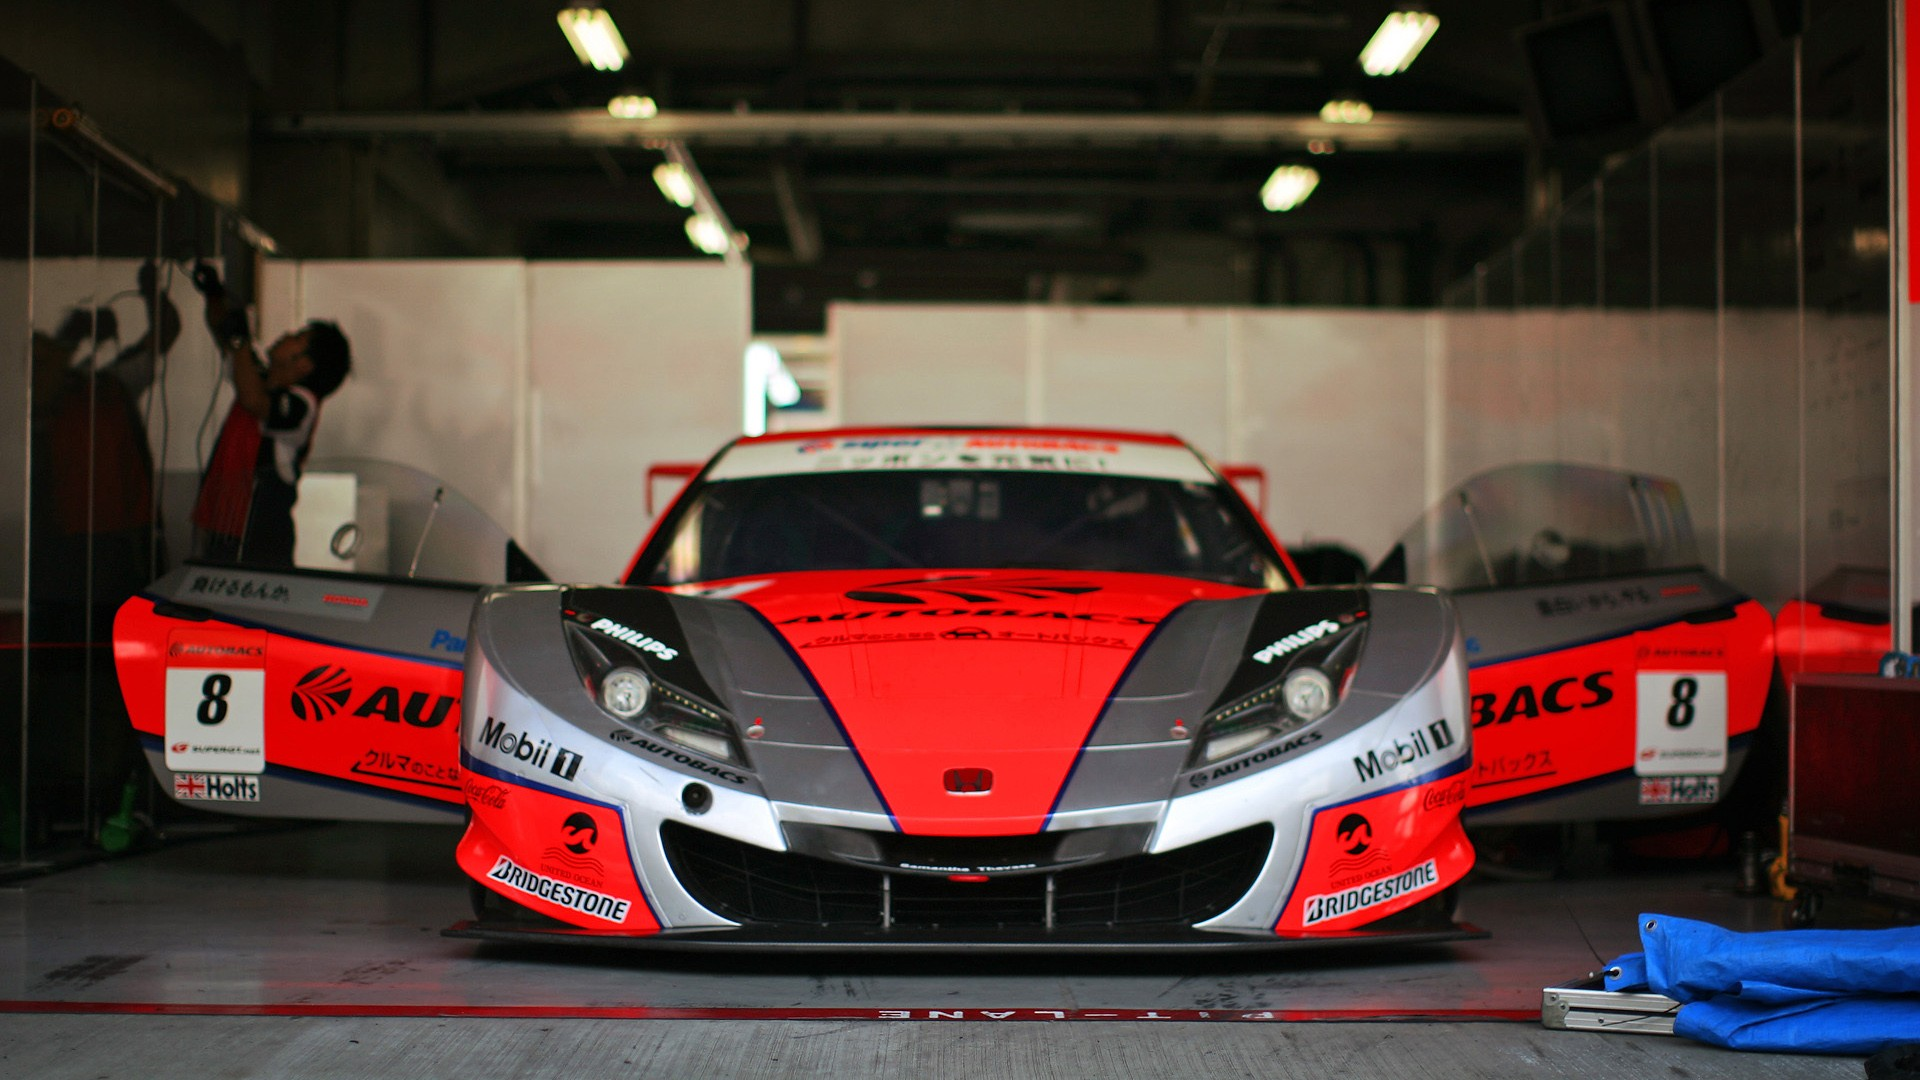 Raybrig Super GT Wallpaper | HD Car Wallpapers | ID #3146